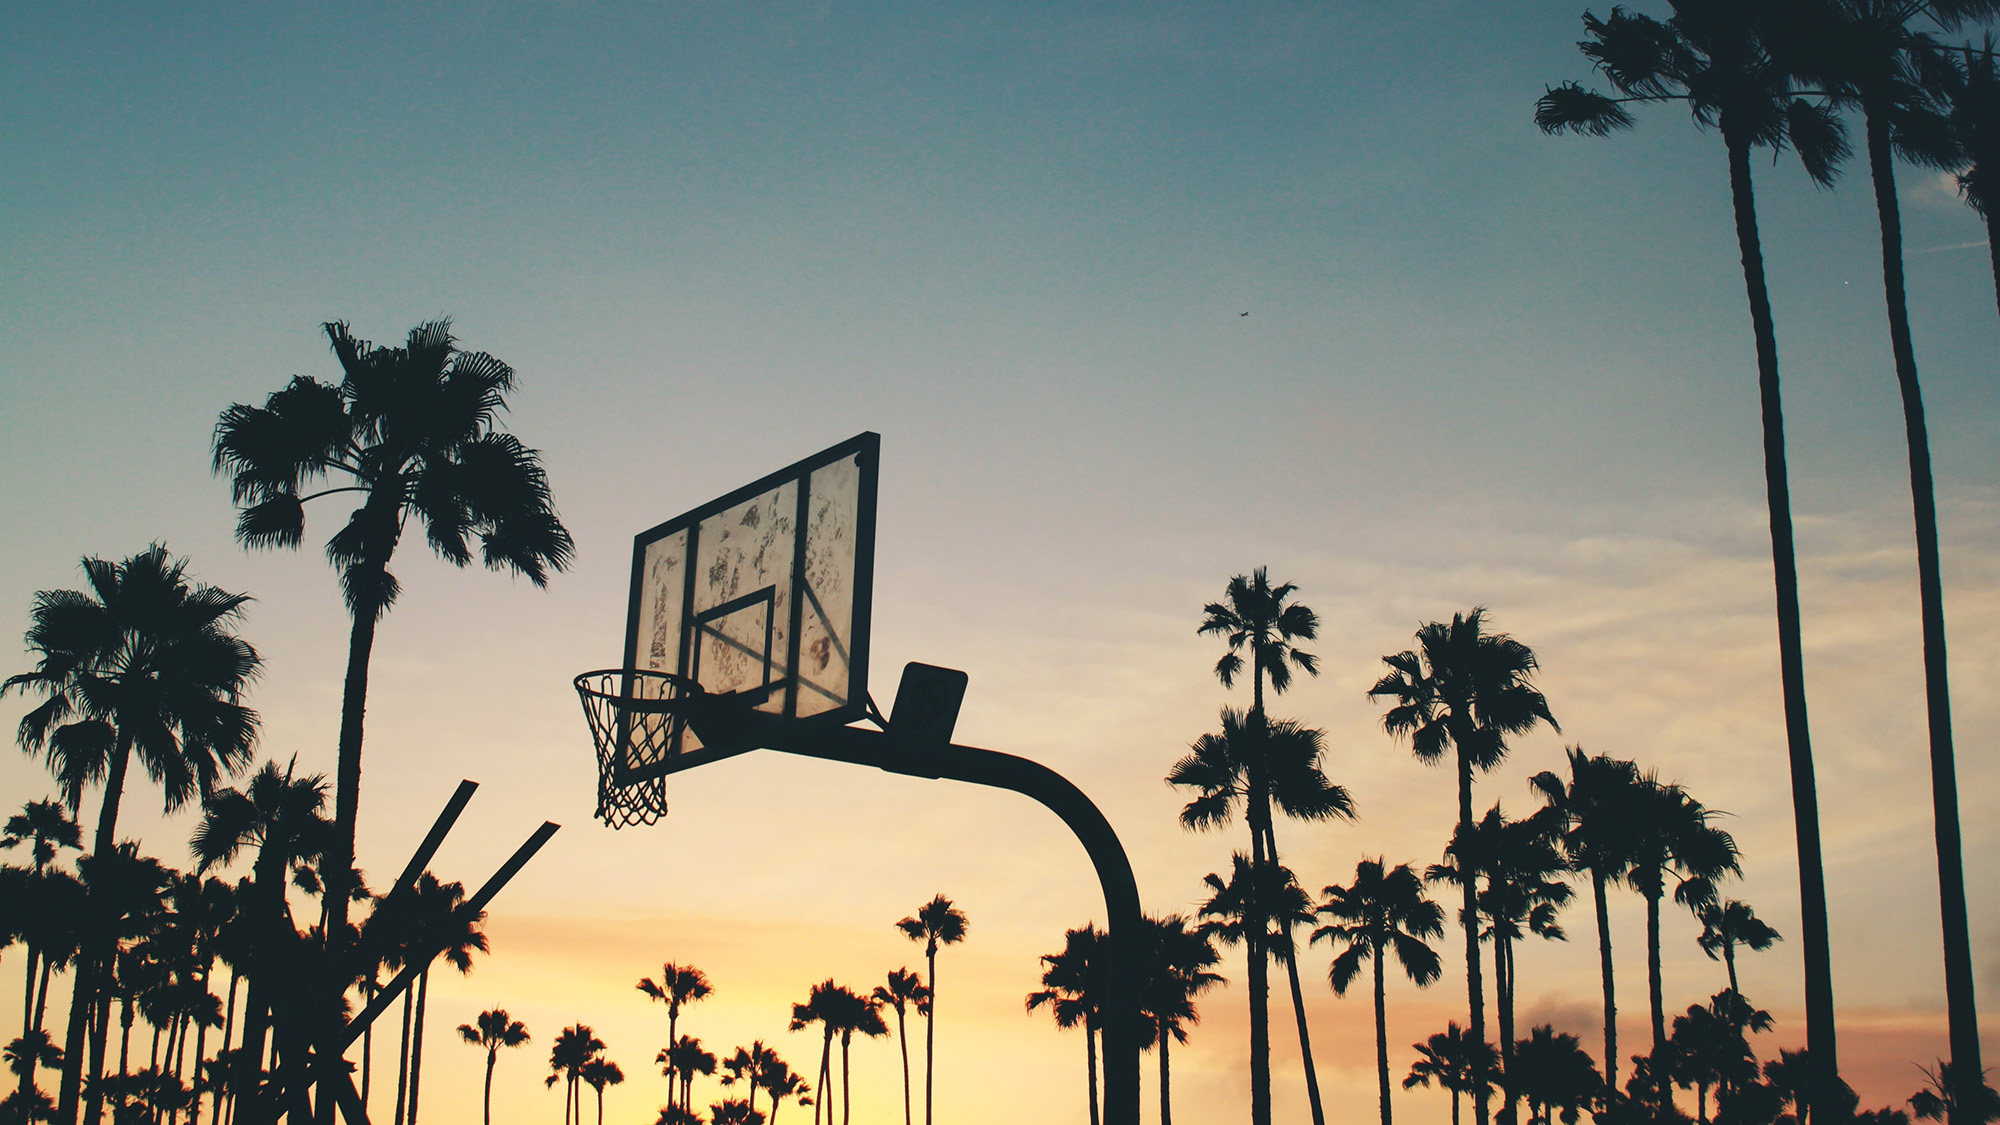 image of outdoor basketball hoop